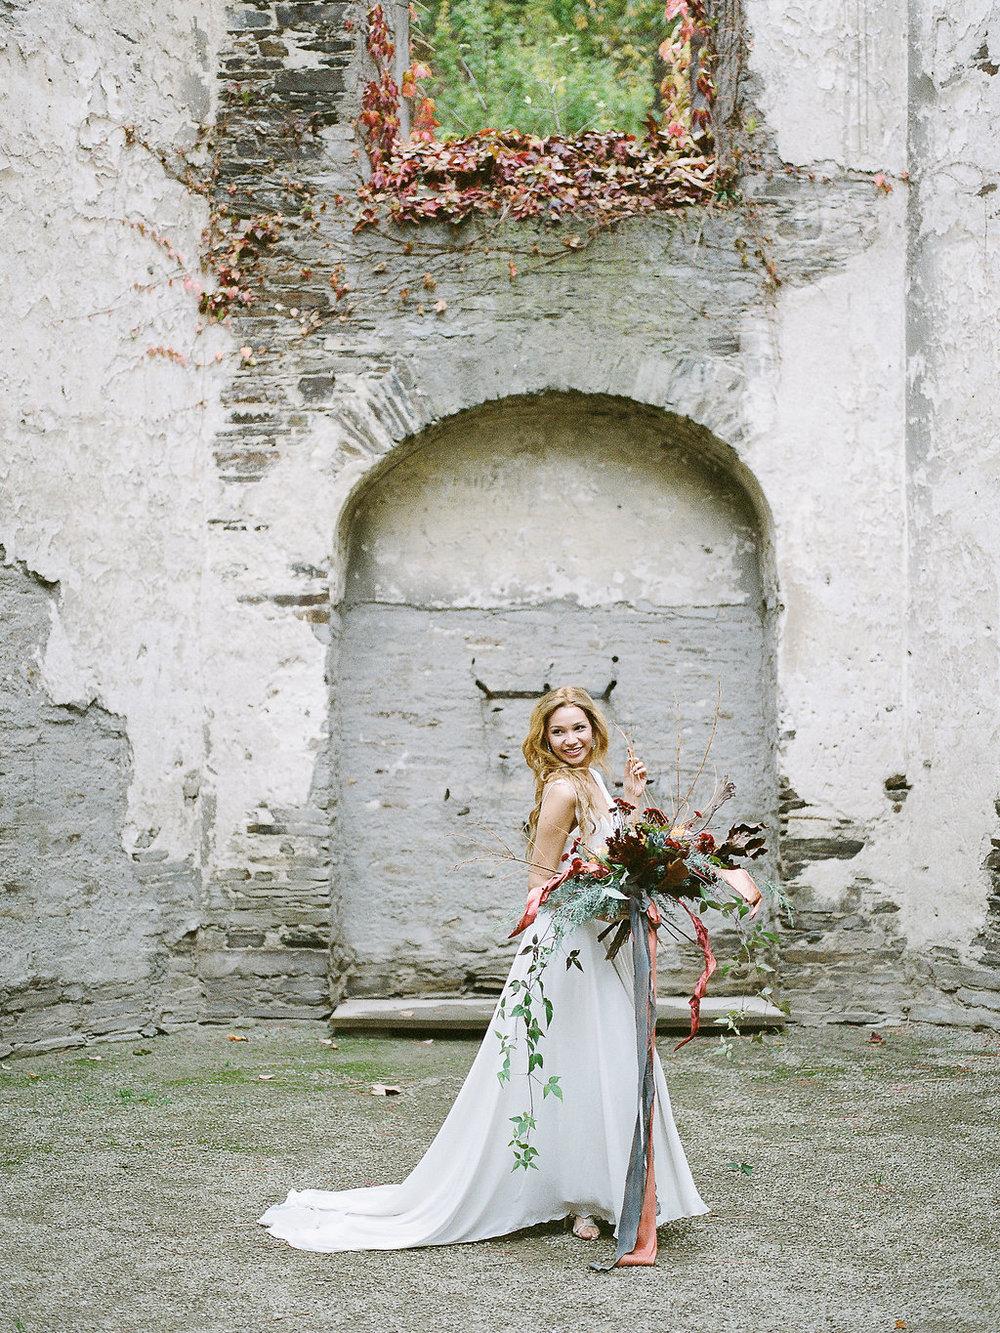 Destination fine art film wedding photographer Tanja Kibogo | autumnal bridal session40.JPG